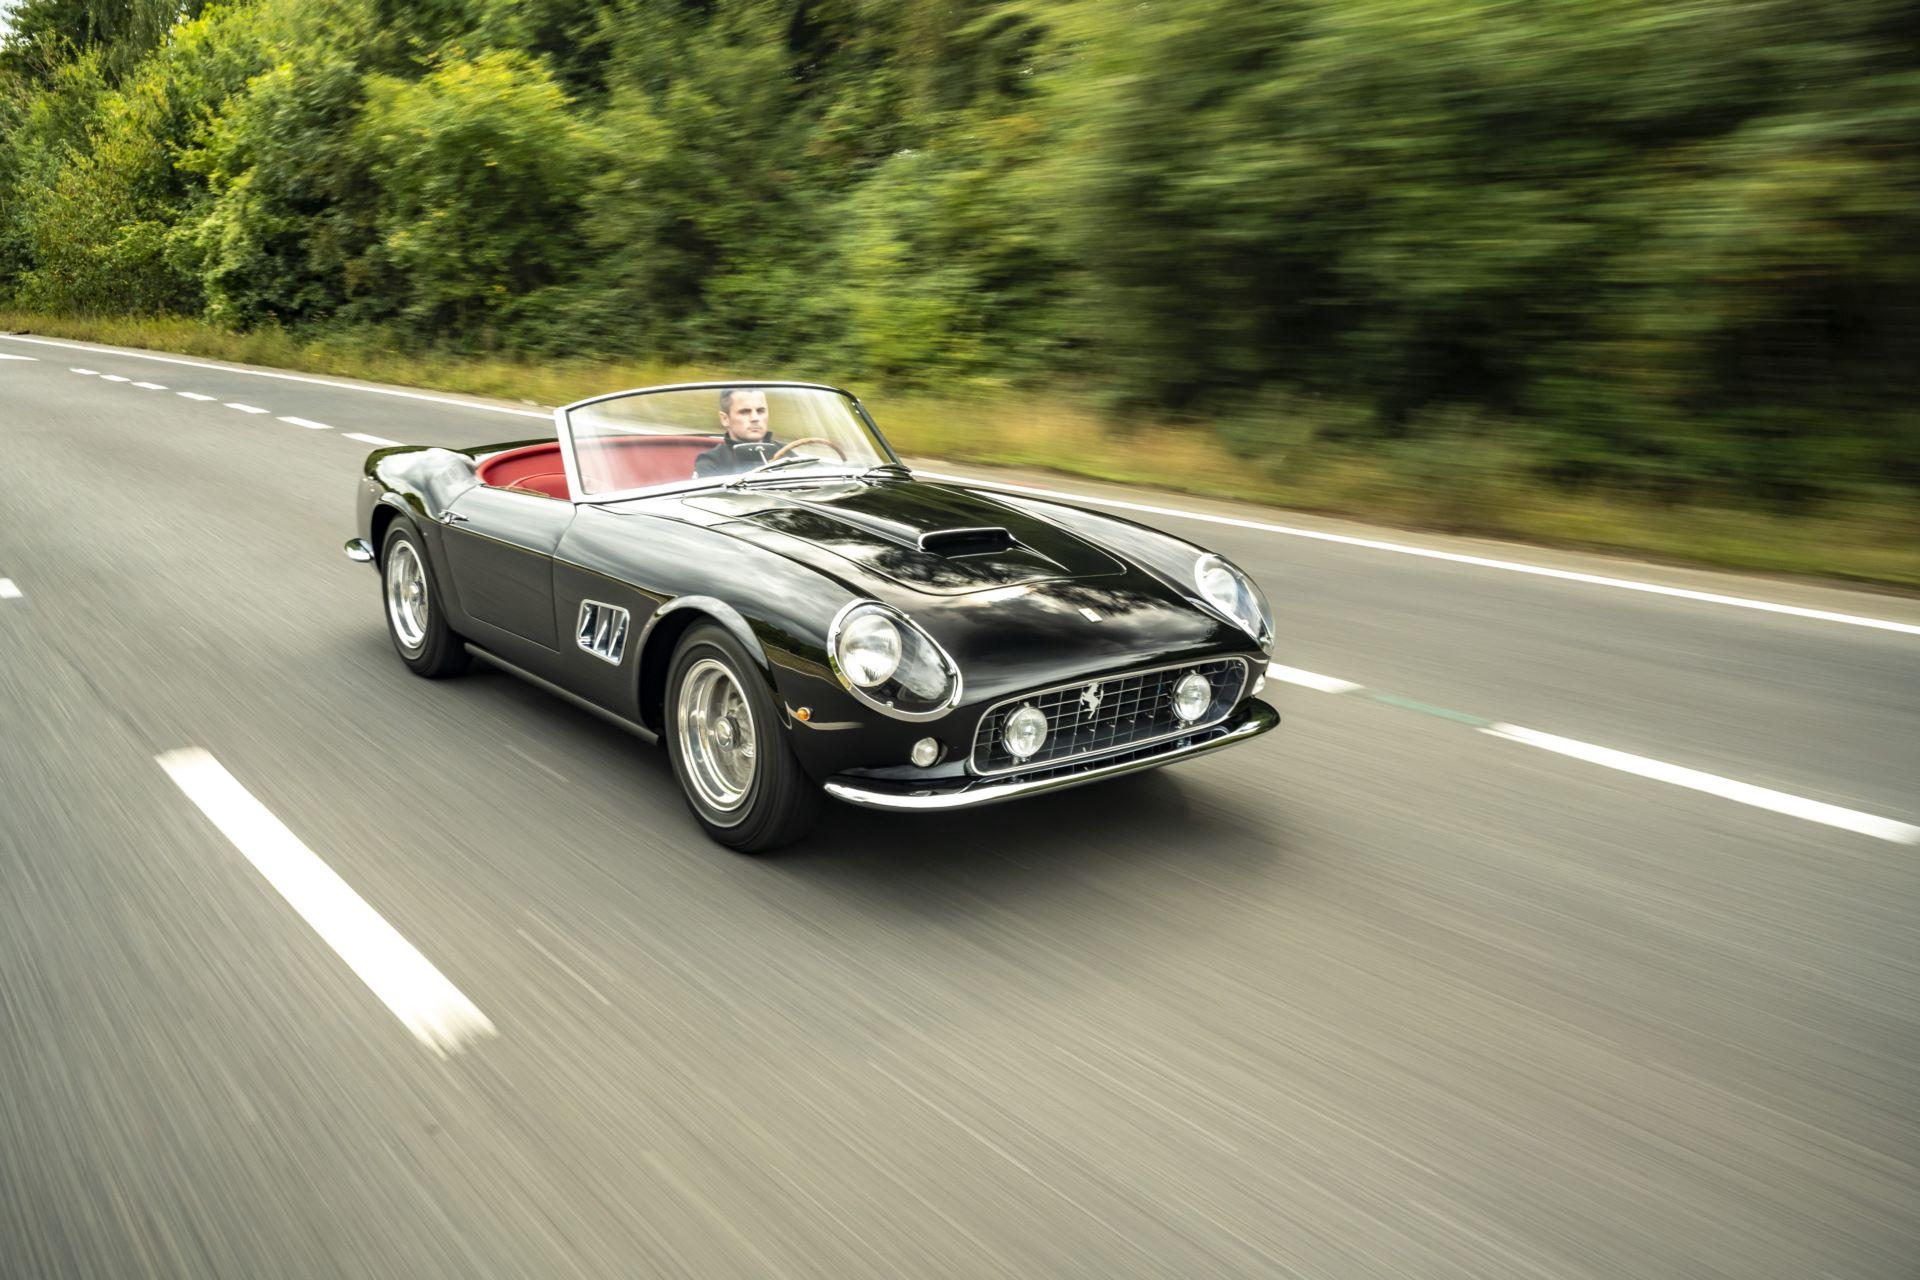 Ferrari-California-Spyder-by-GTO-Engineering-5